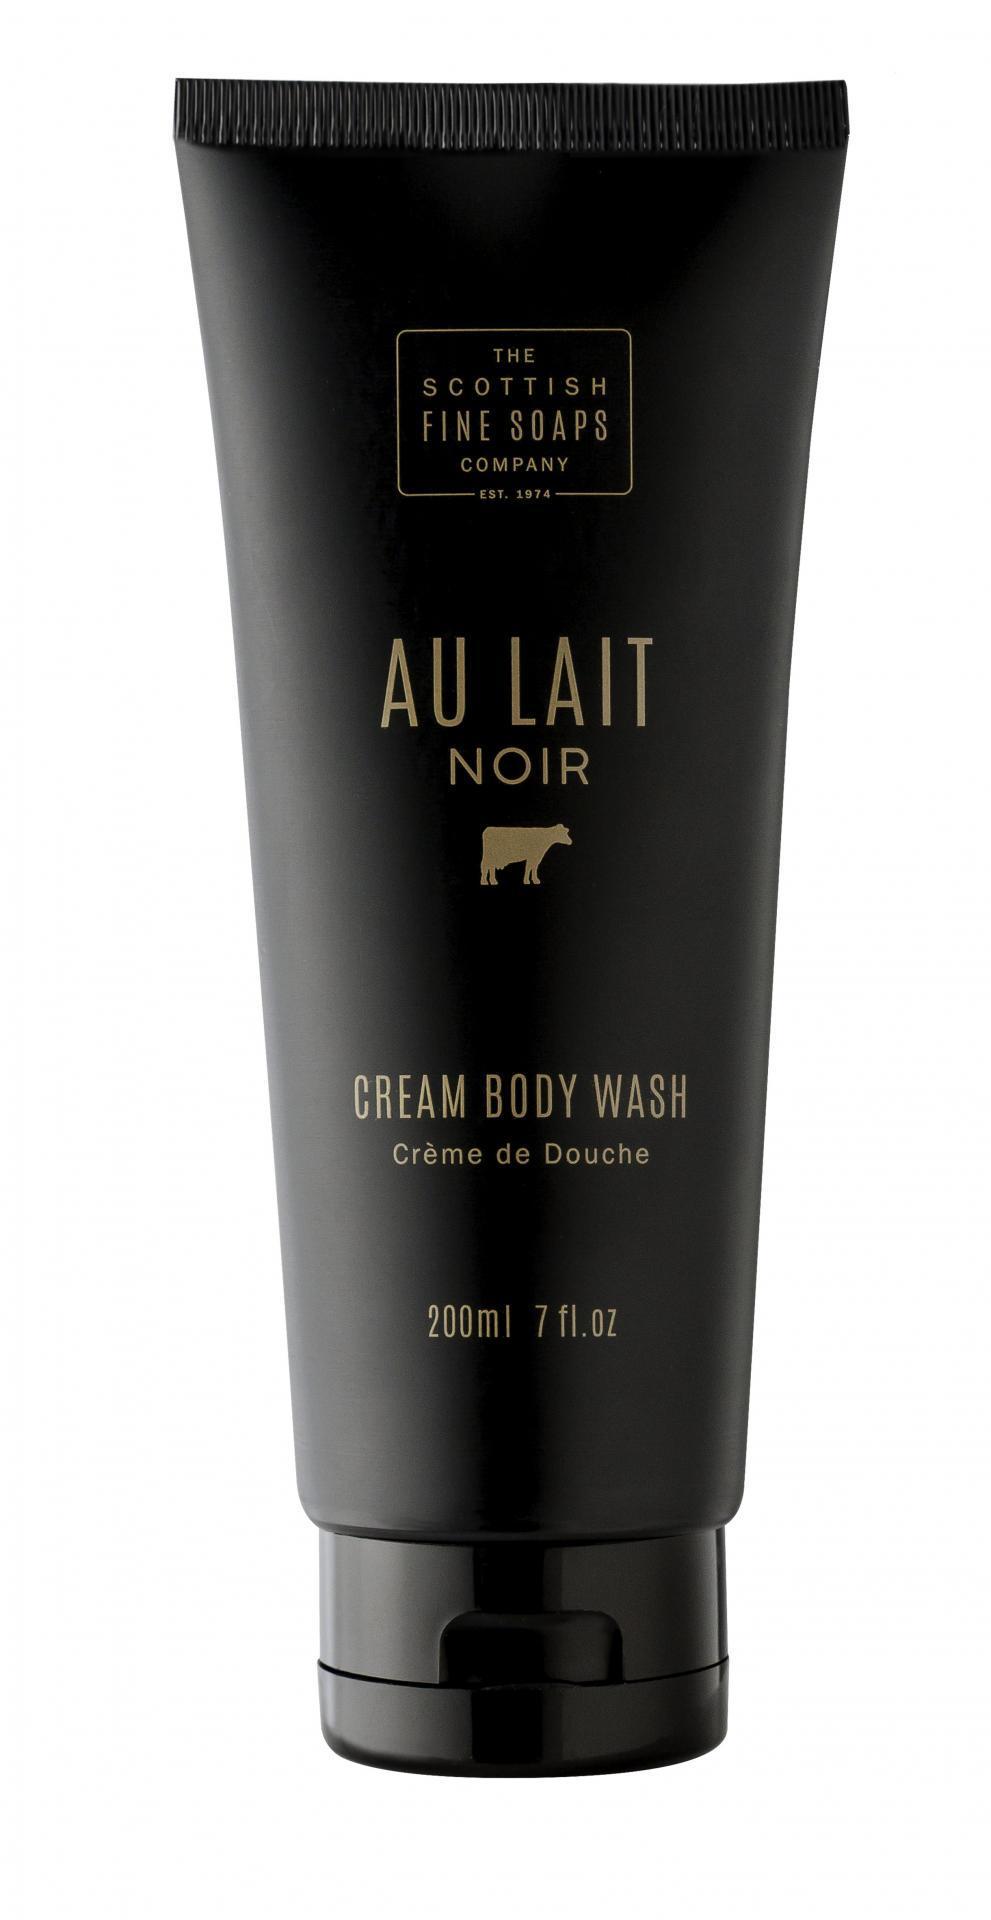 SCOTTISH FINE SOAPS Sprchový gel Au Lait Noir 200ml, černá barva, plast